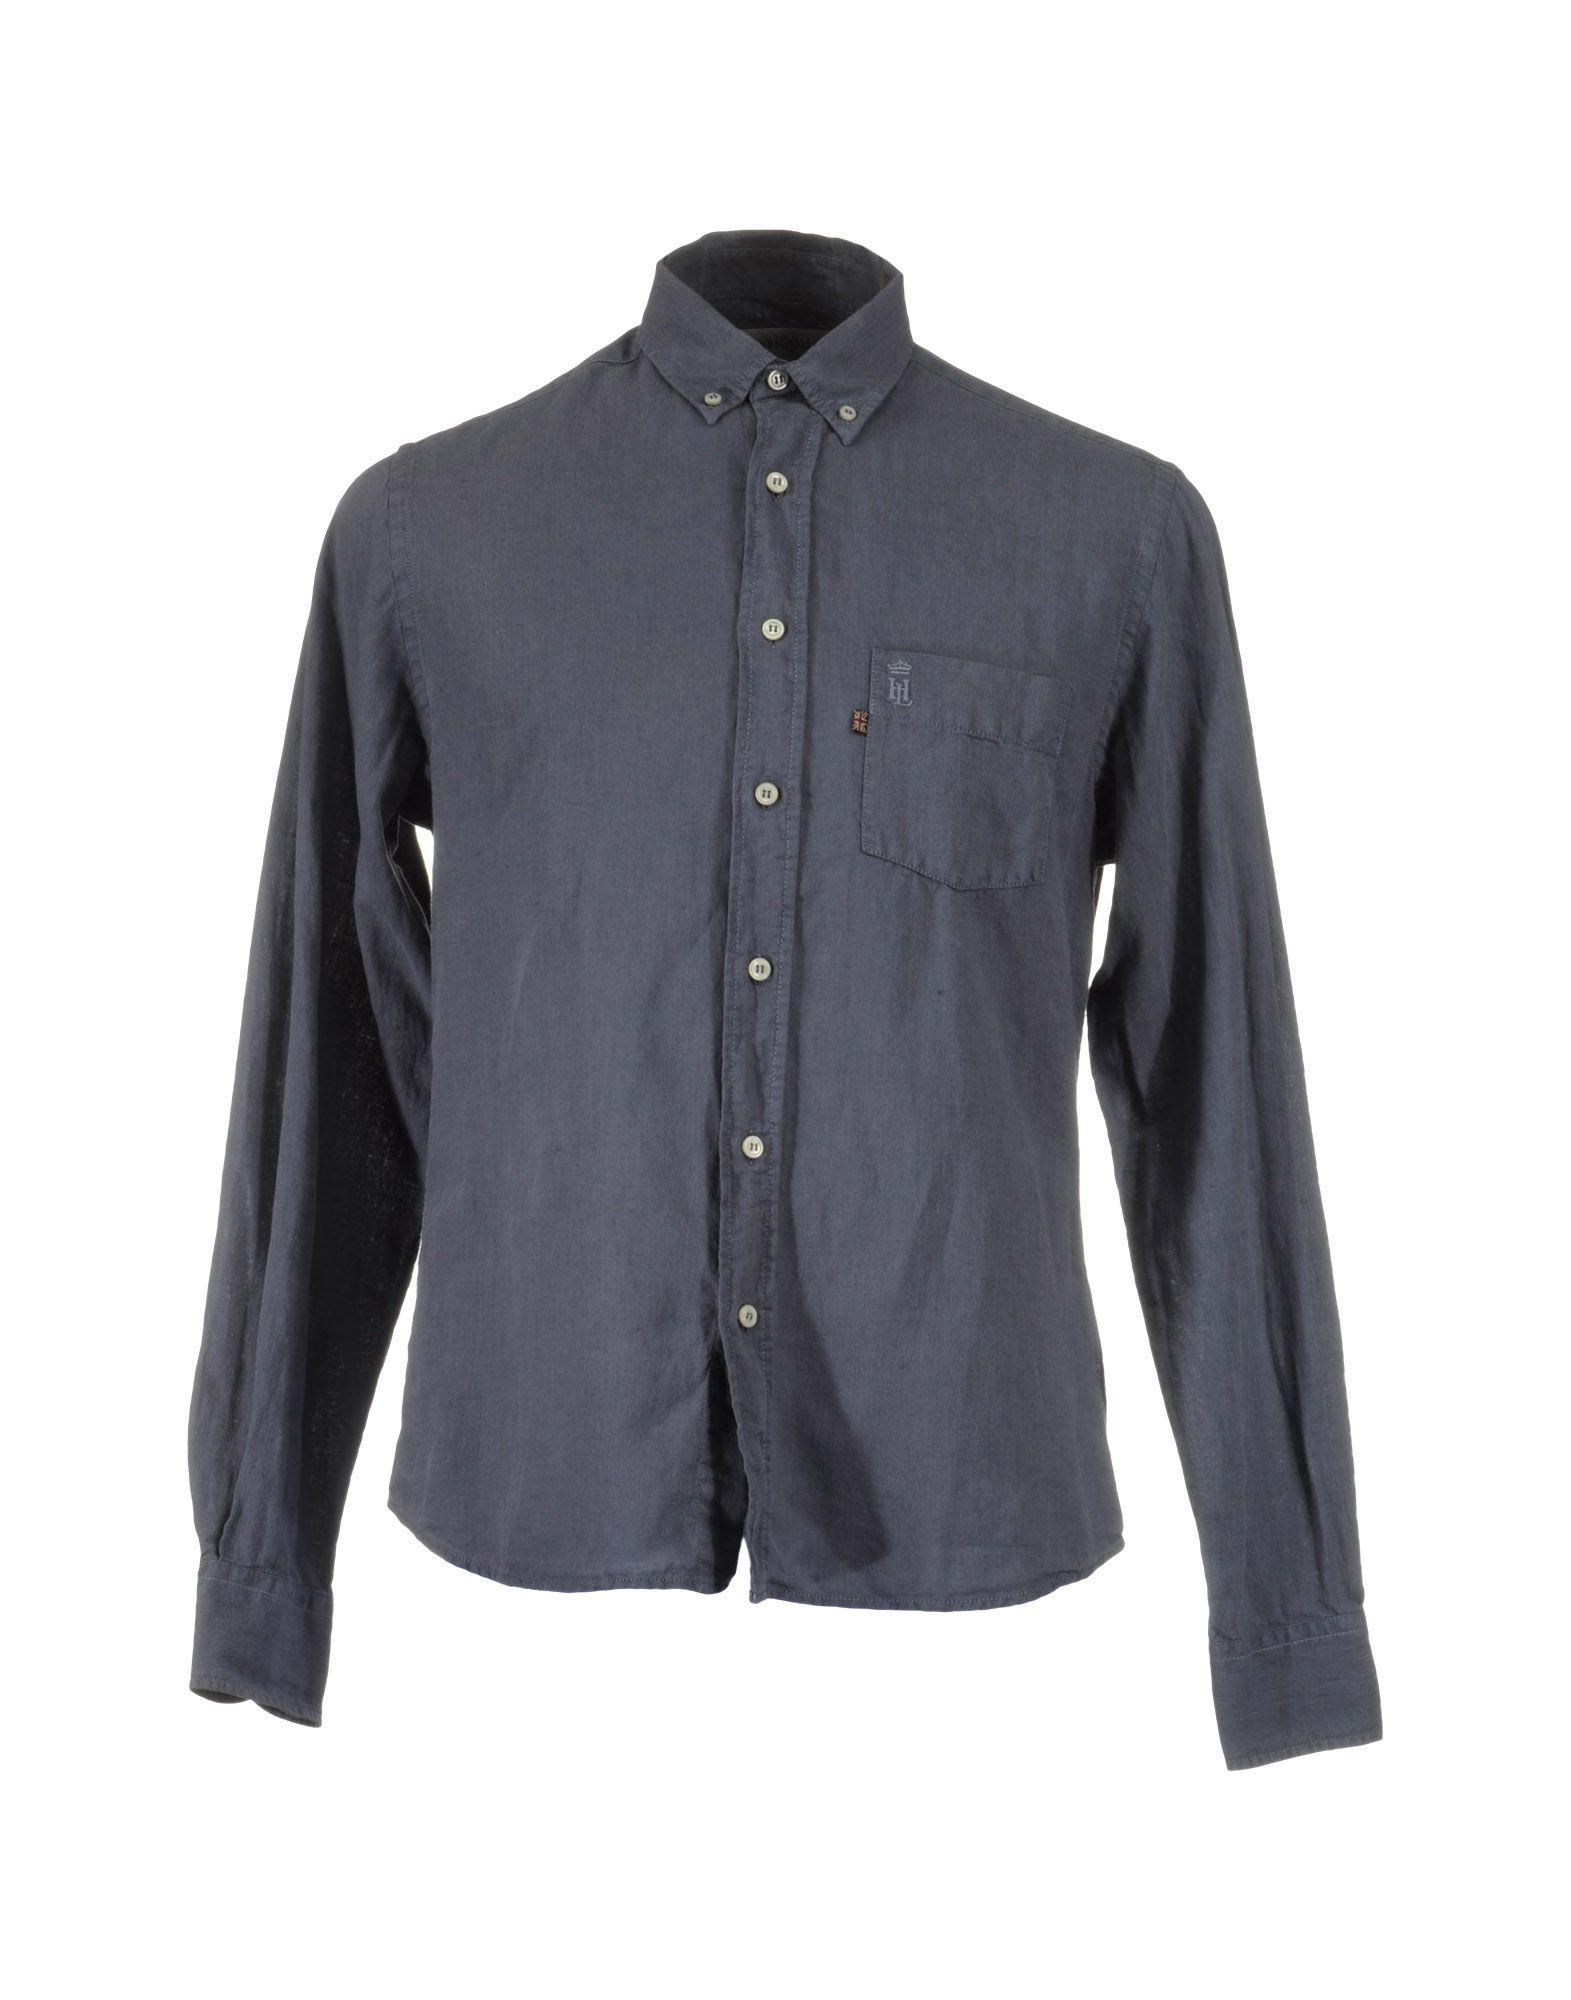 HENRI LLOYD Рубашка с длинными рукавами cityplus фан арт воротник диких дна рубашка рыхлая с длинными рукавами розовая рубашка cwcc172473 l